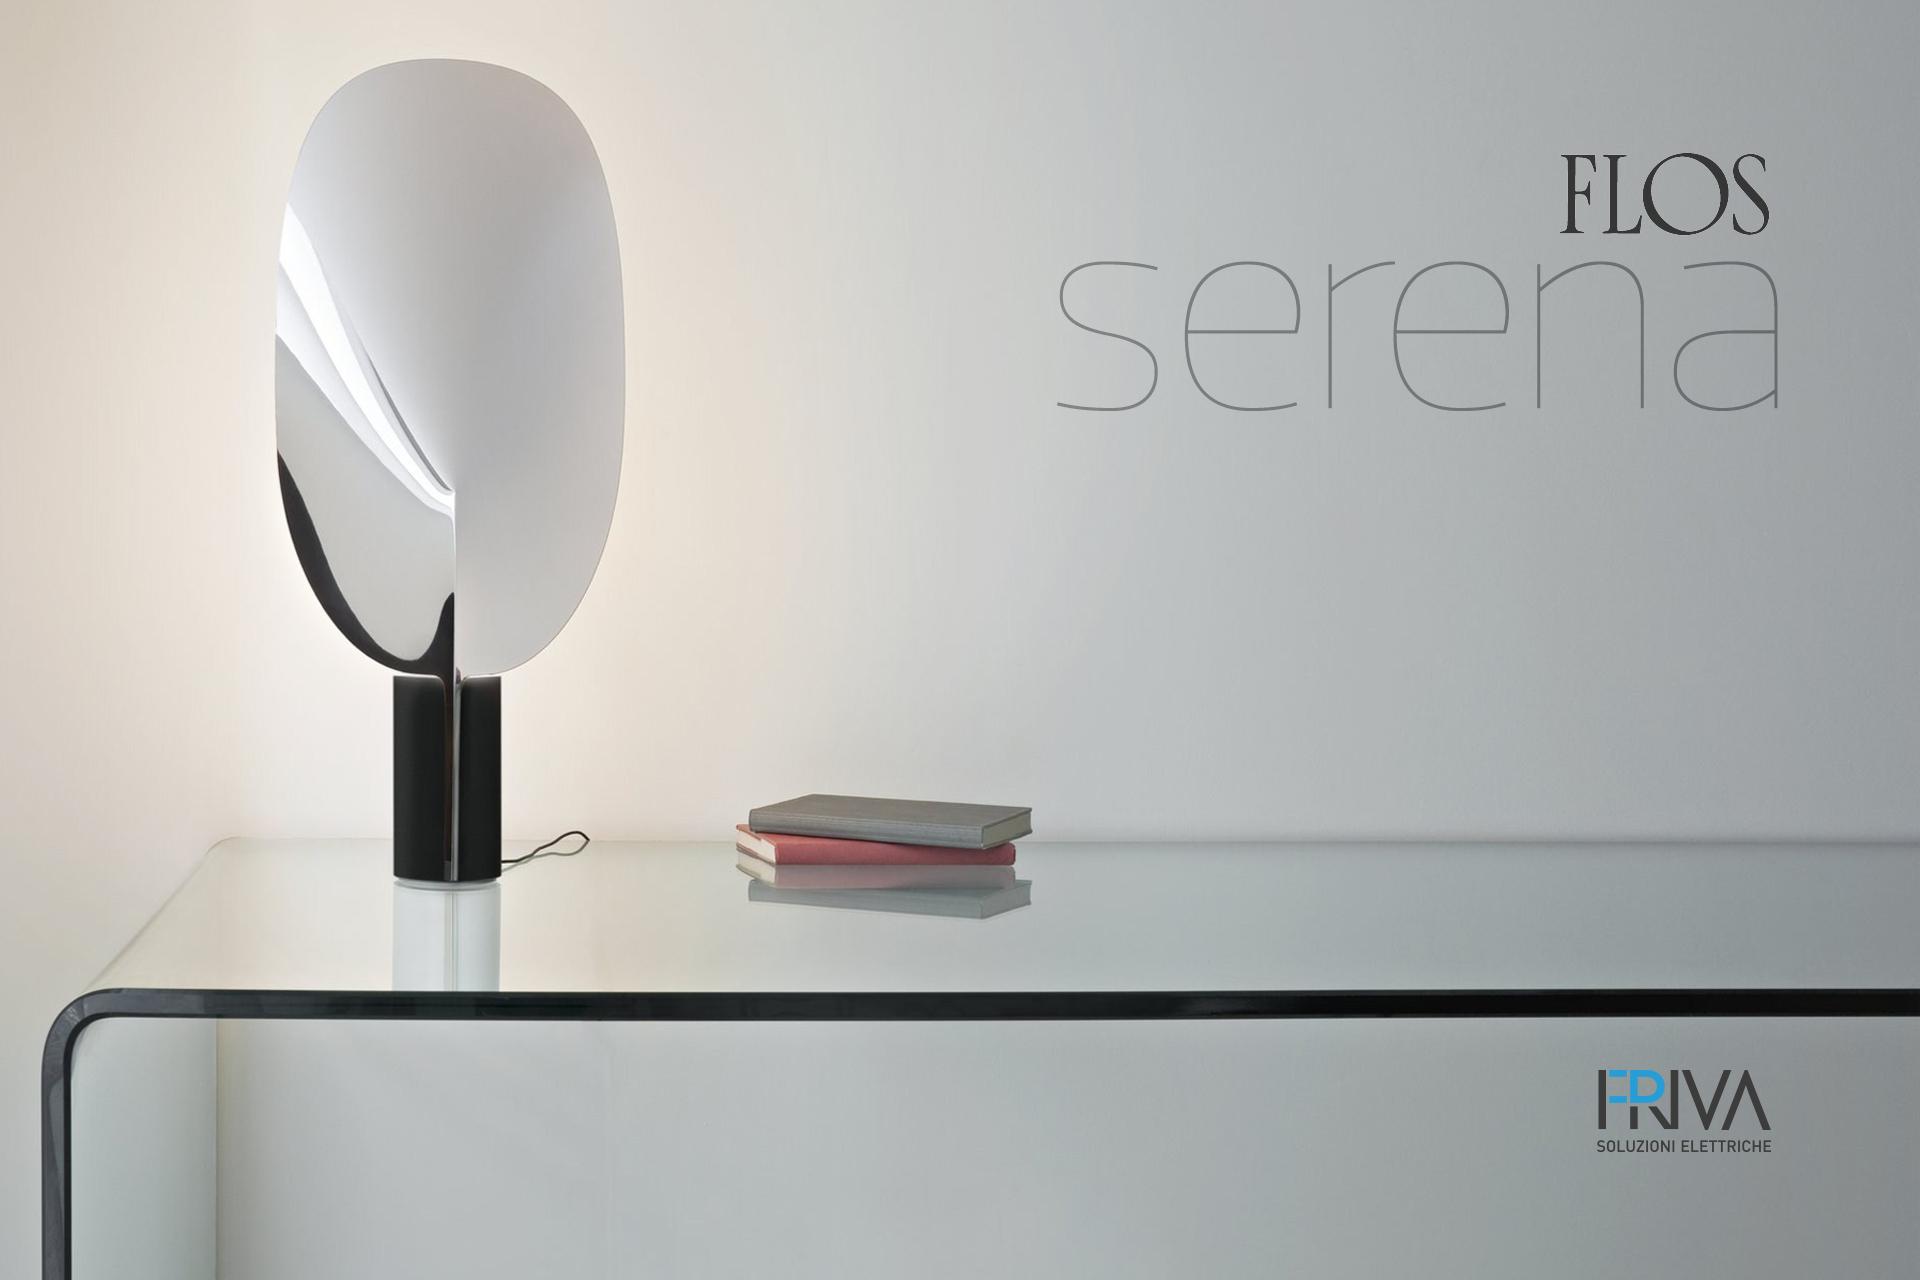 Lampade Da Tavolo Flos : Serena lampada tavolo flos illuminazione roma tulli luce